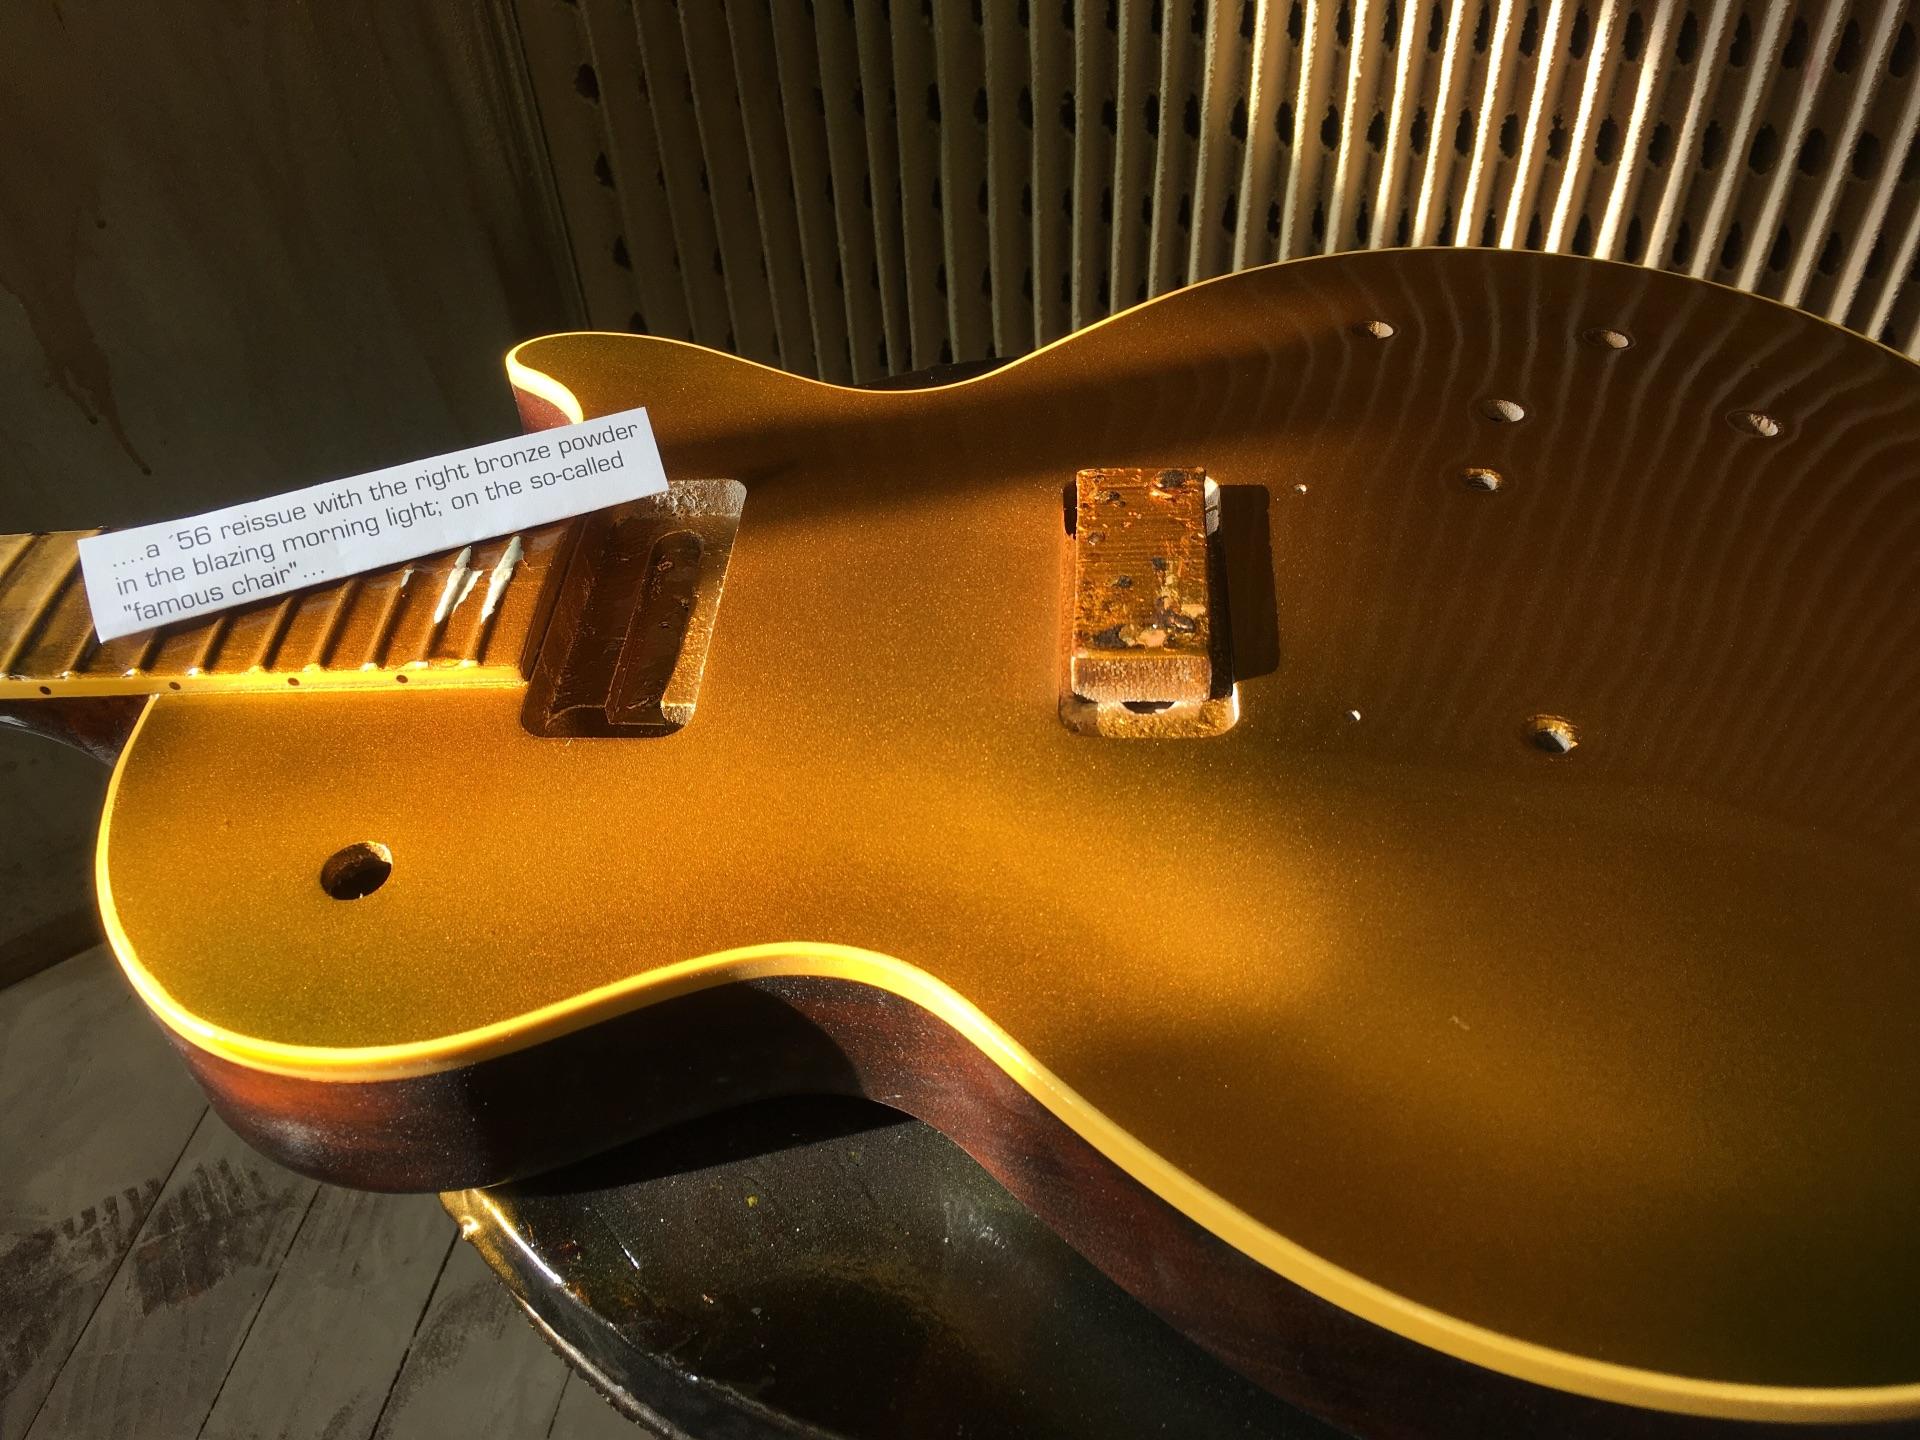 Lately & notably Jaeger Guitars